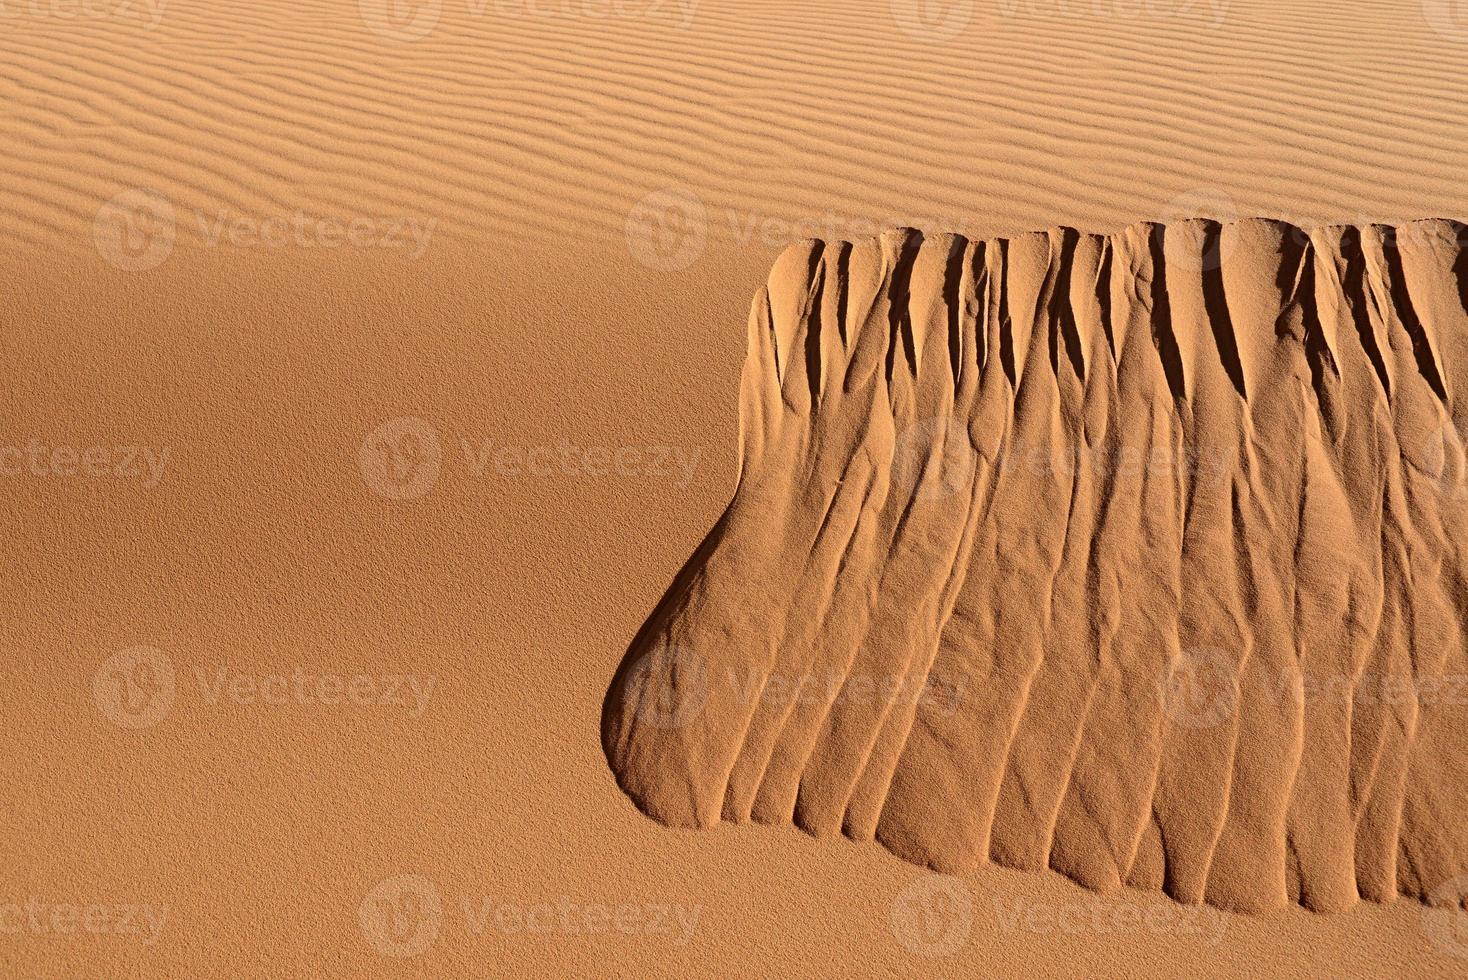 fond du désert photo